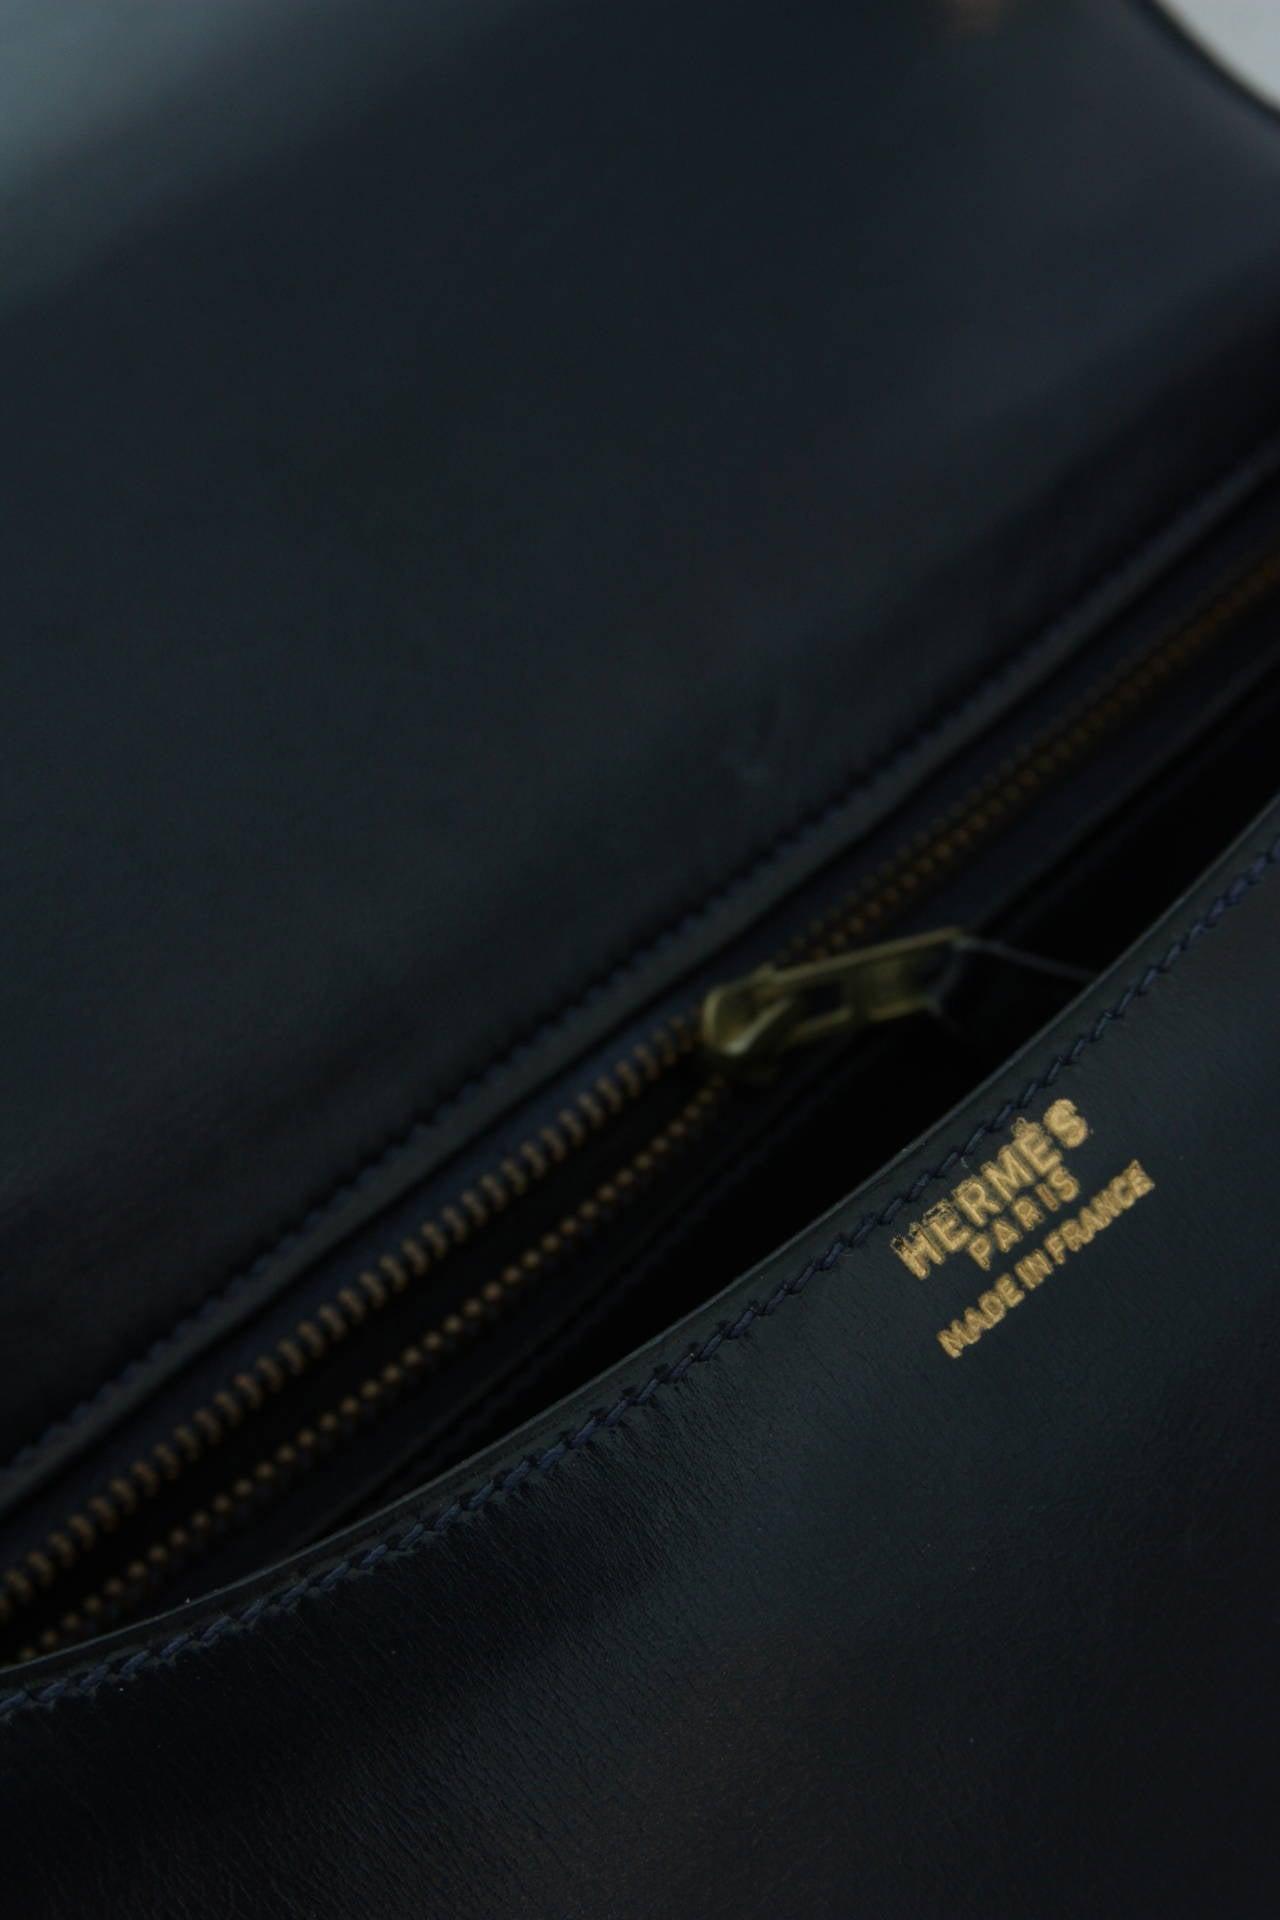 Hermes Vintage Navy Blue Box Leather Constance 23Cm at 1stdibs